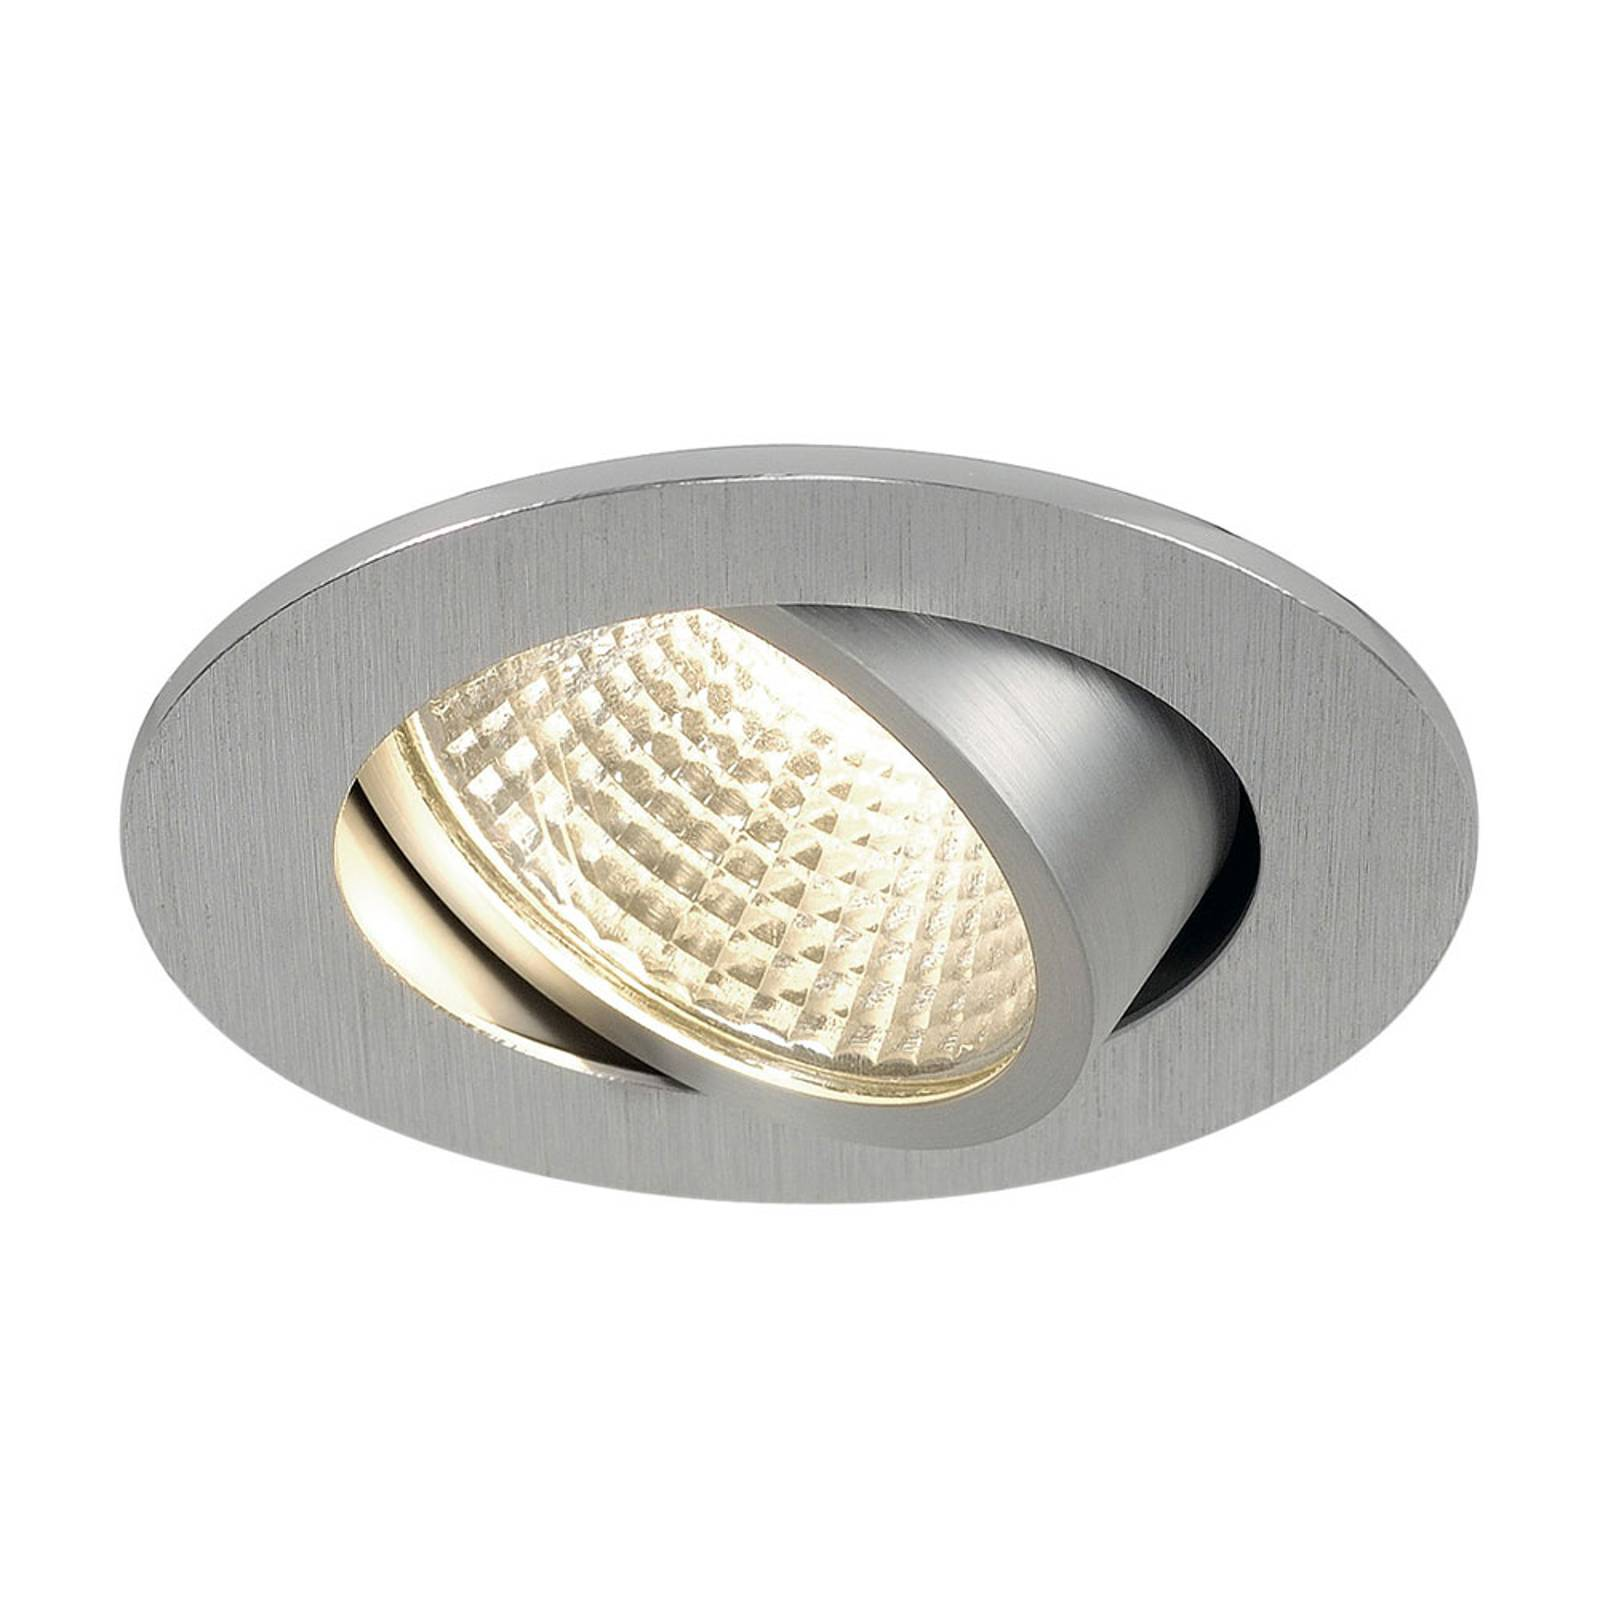 SLV New Tria 1 set spot LED rotondo alluminio